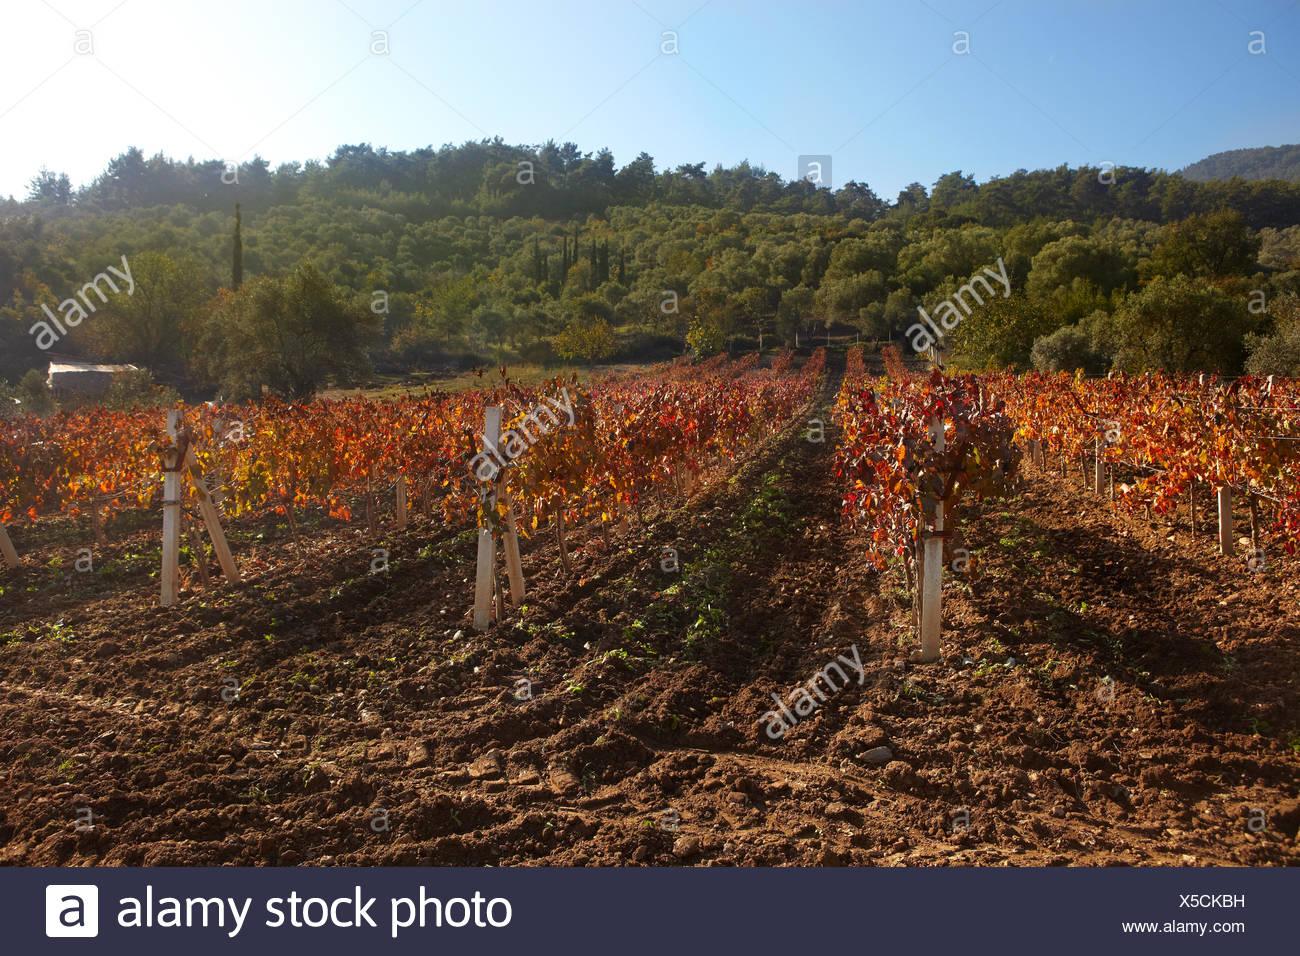 vineyard vines farm wineyard rural peasant ground soil earth humus brown - Stock Image